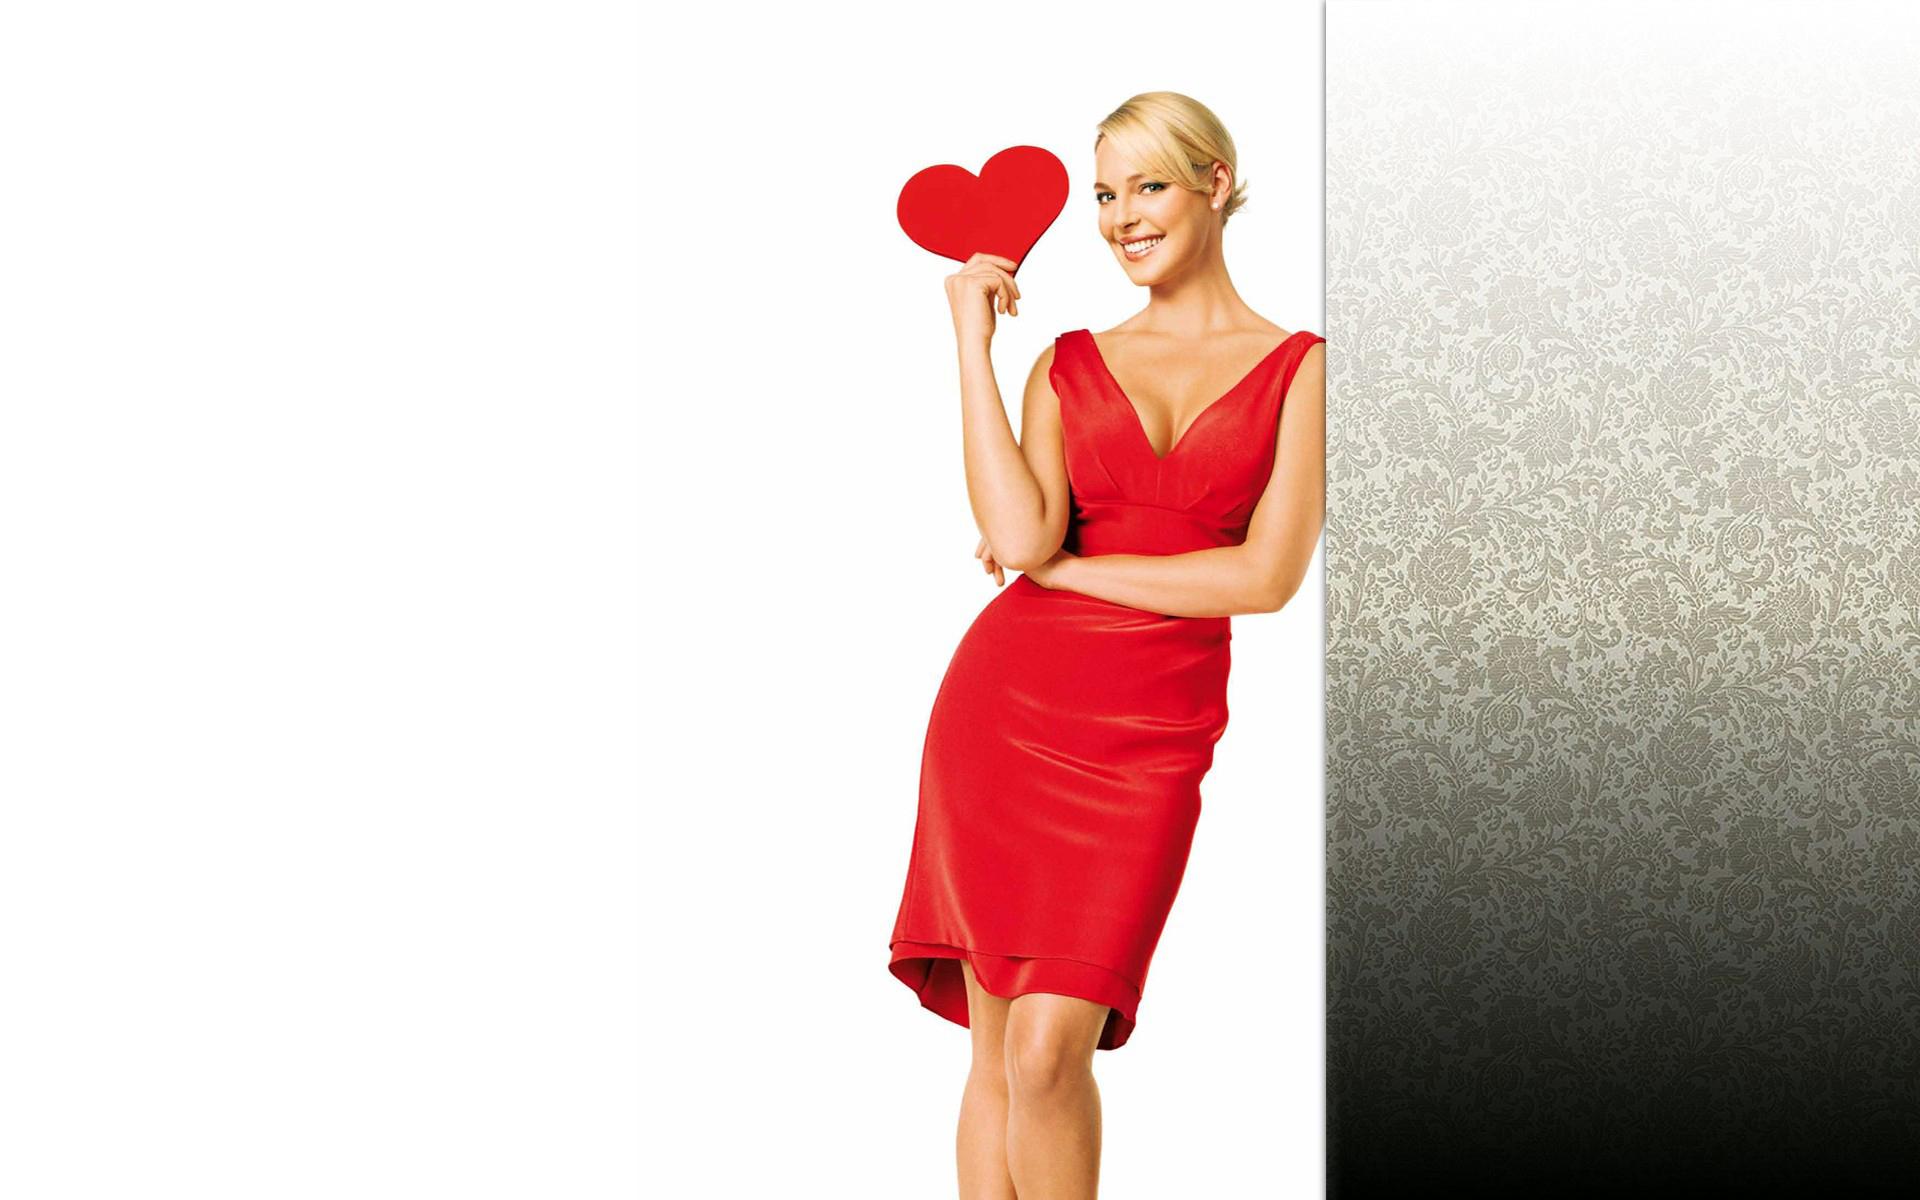 katherine heigl hot actress 4k wallpaper 2505